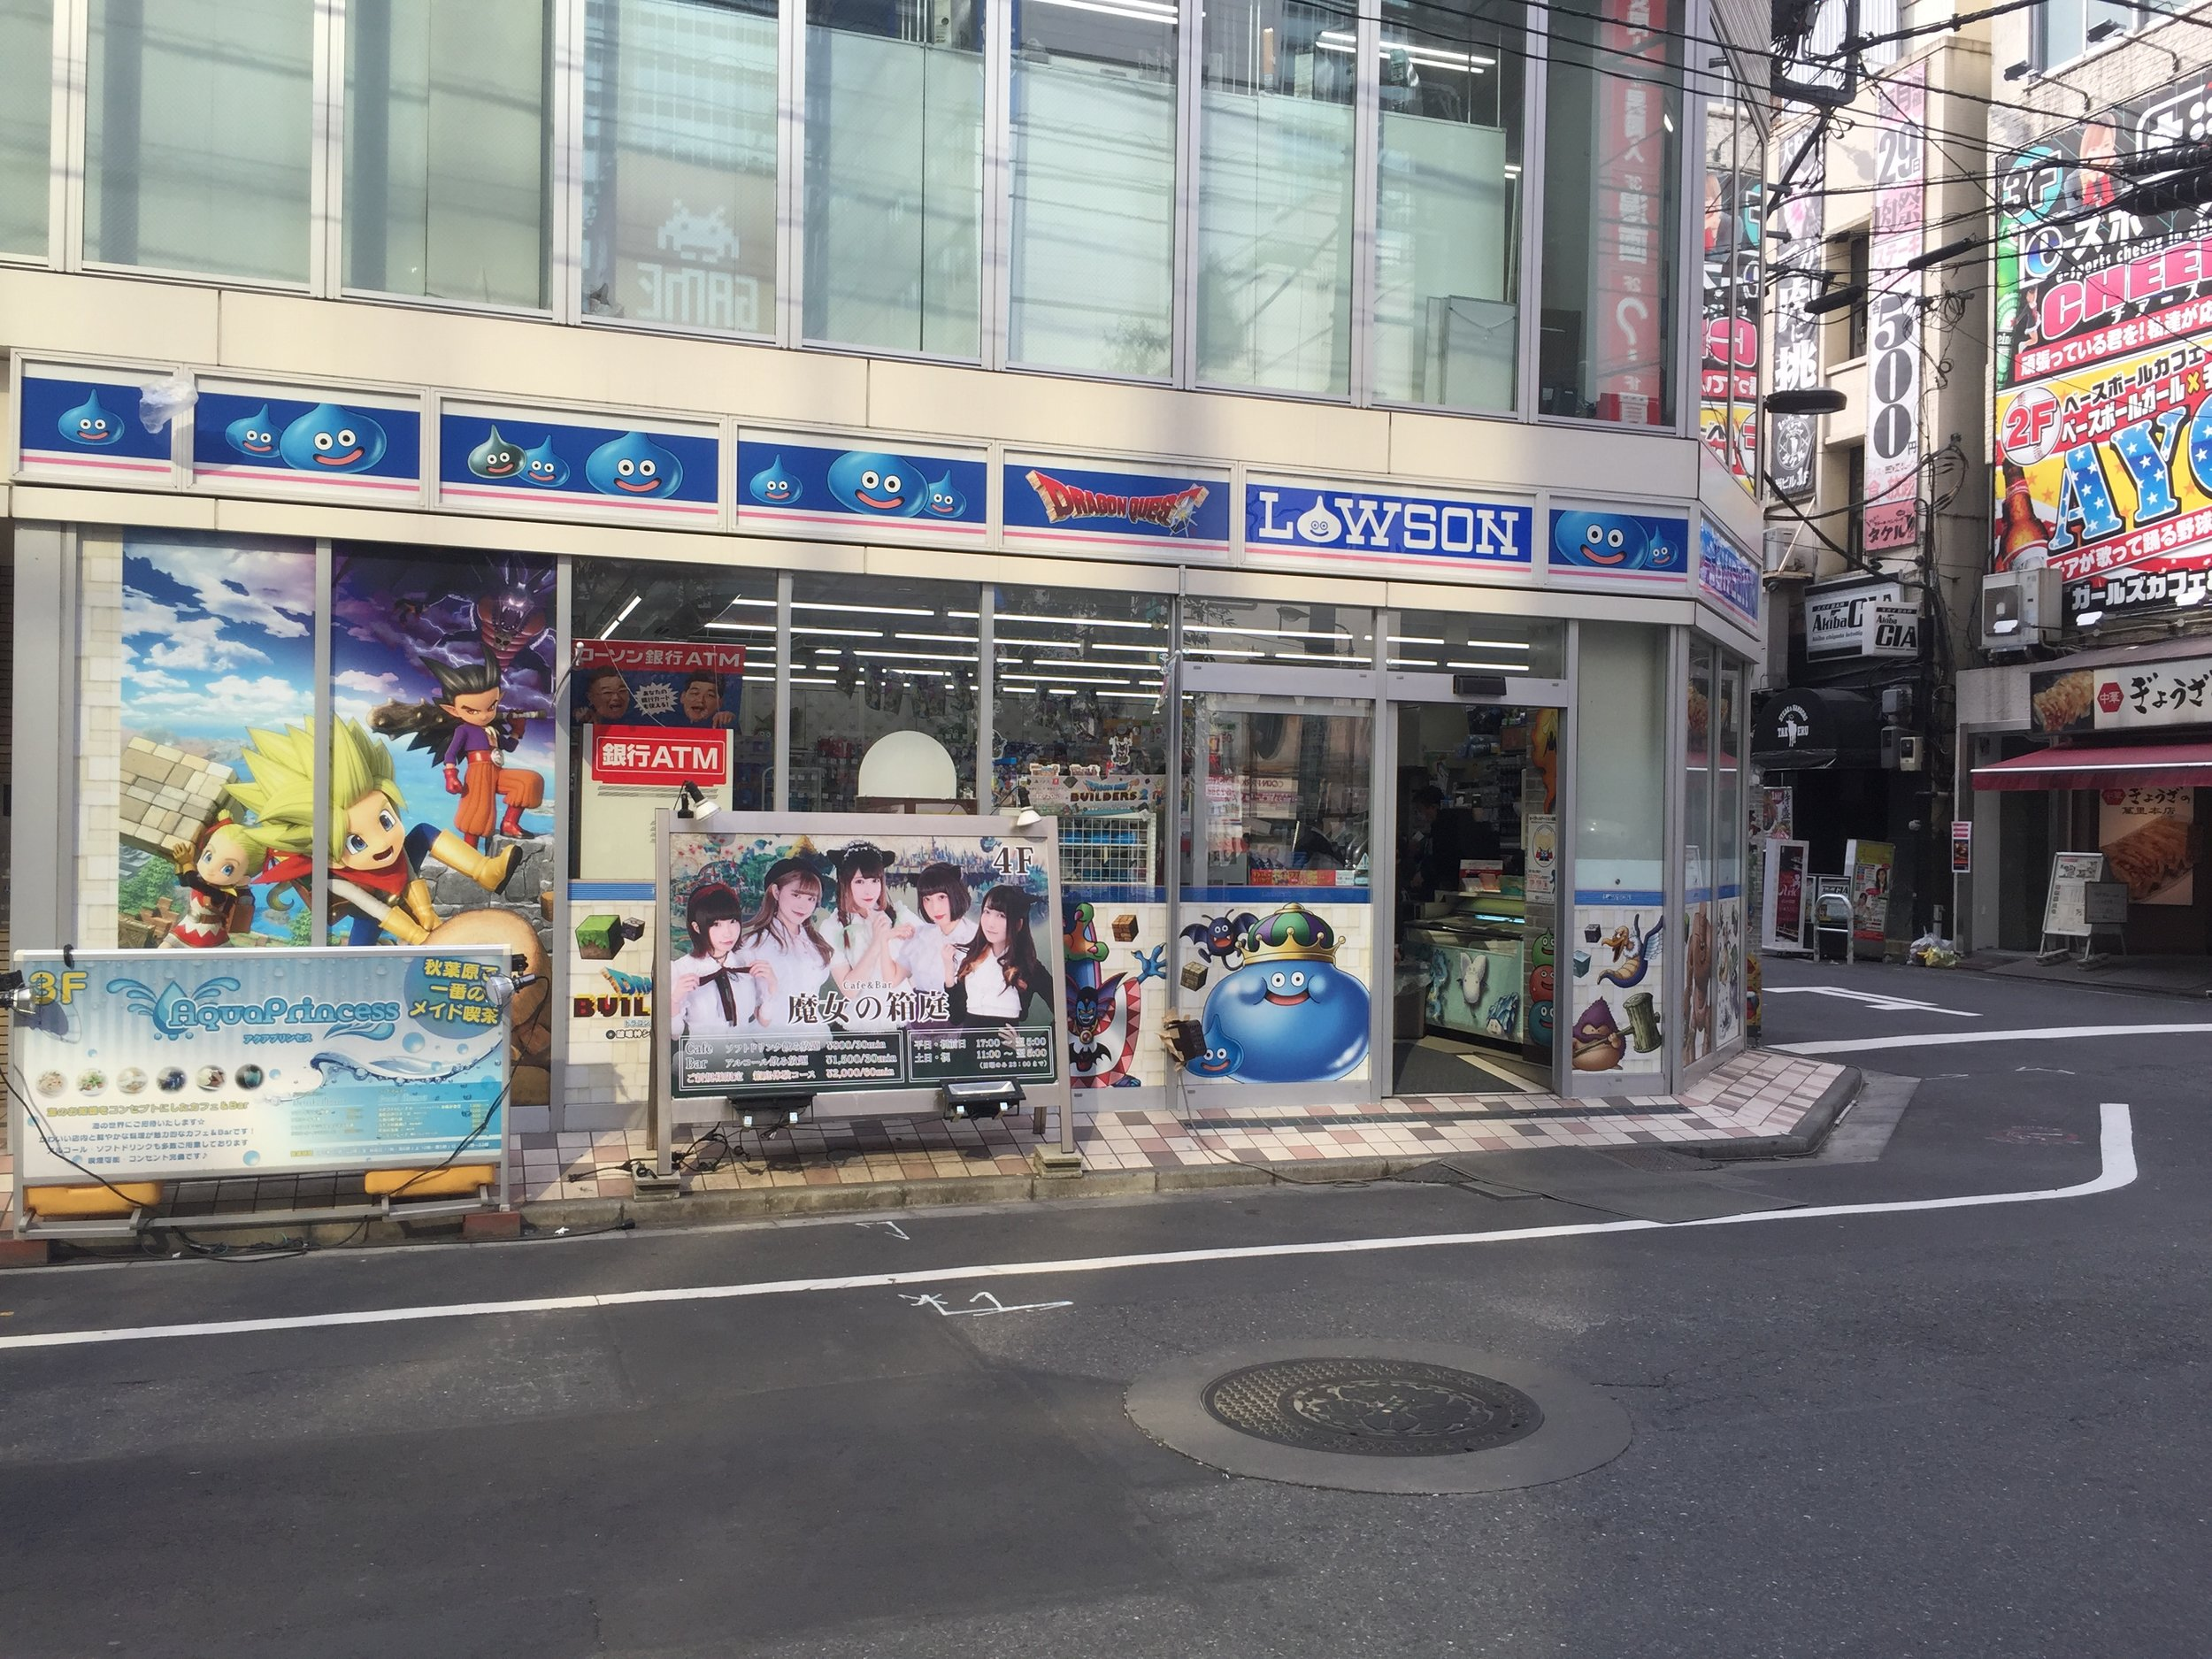 dragon quest lawson convenience store in akihabara tokyo akiba.JPG